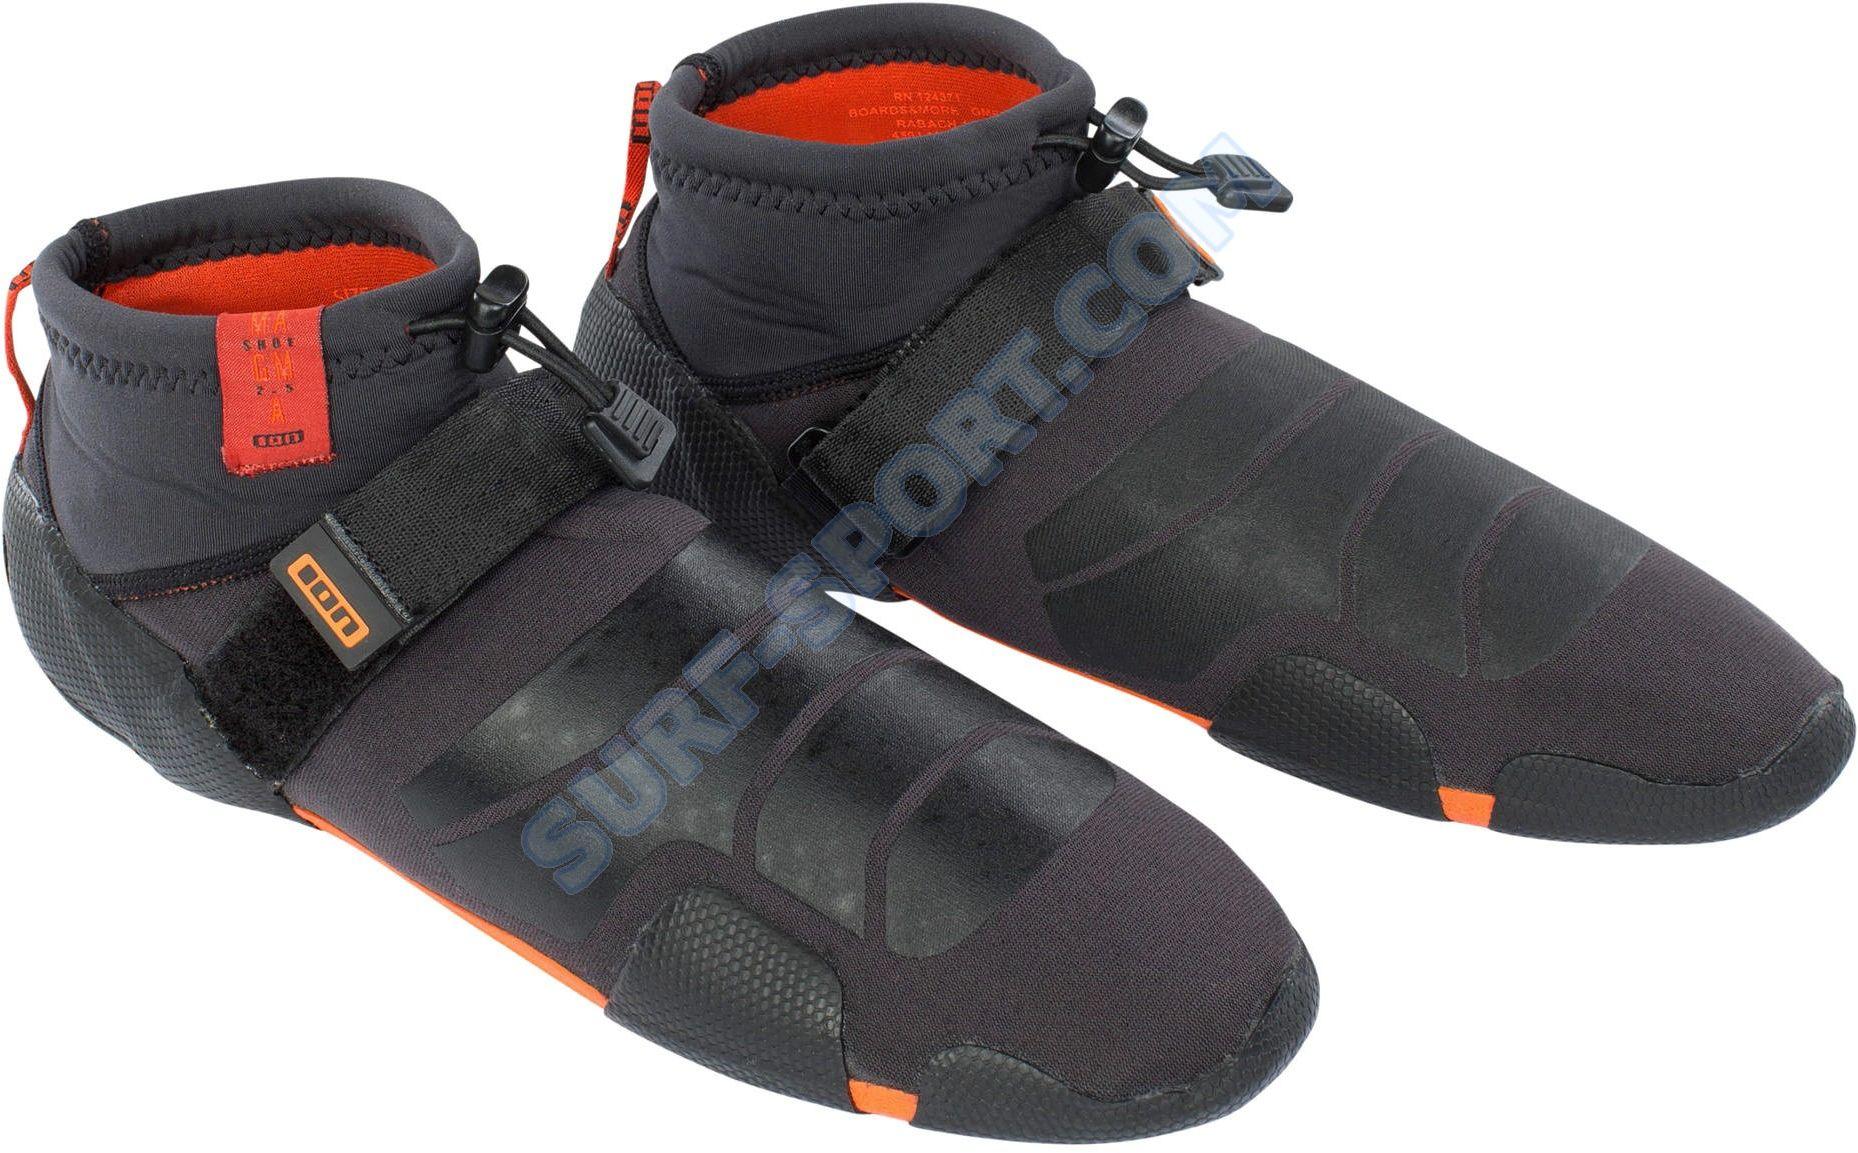 Buty Neoprenowe ION Magma Shoes 2.5 RT-2018